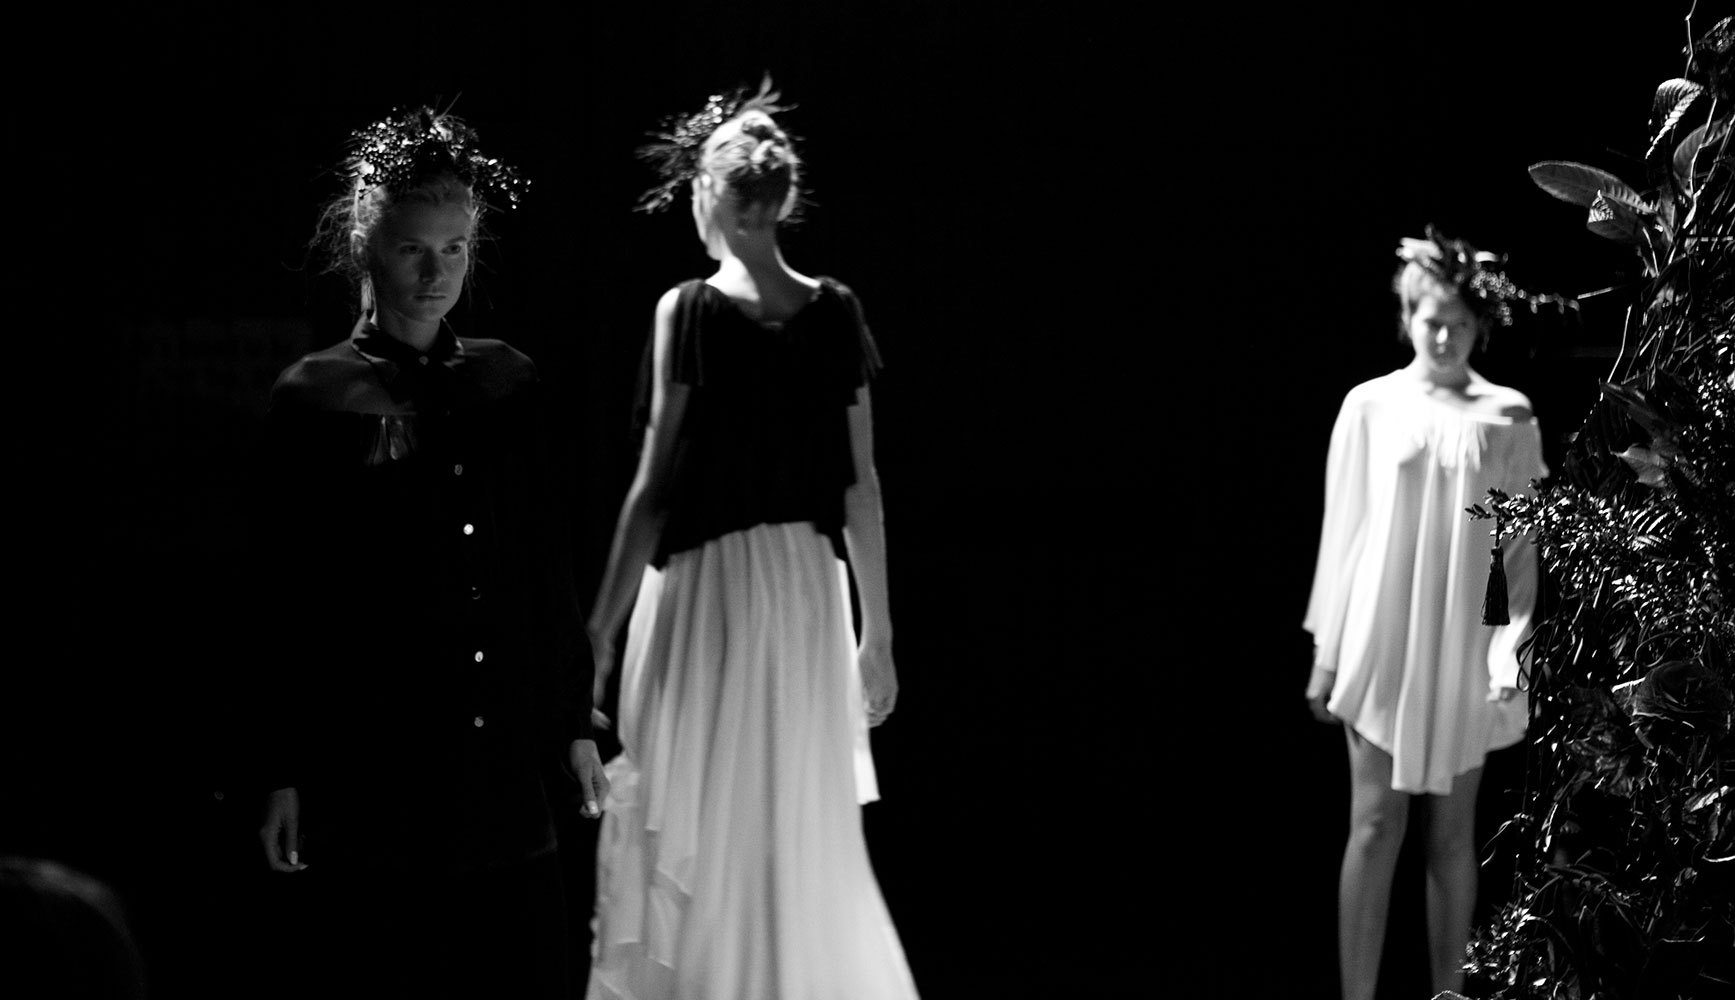 lila-boheme-backstage-6.jpg